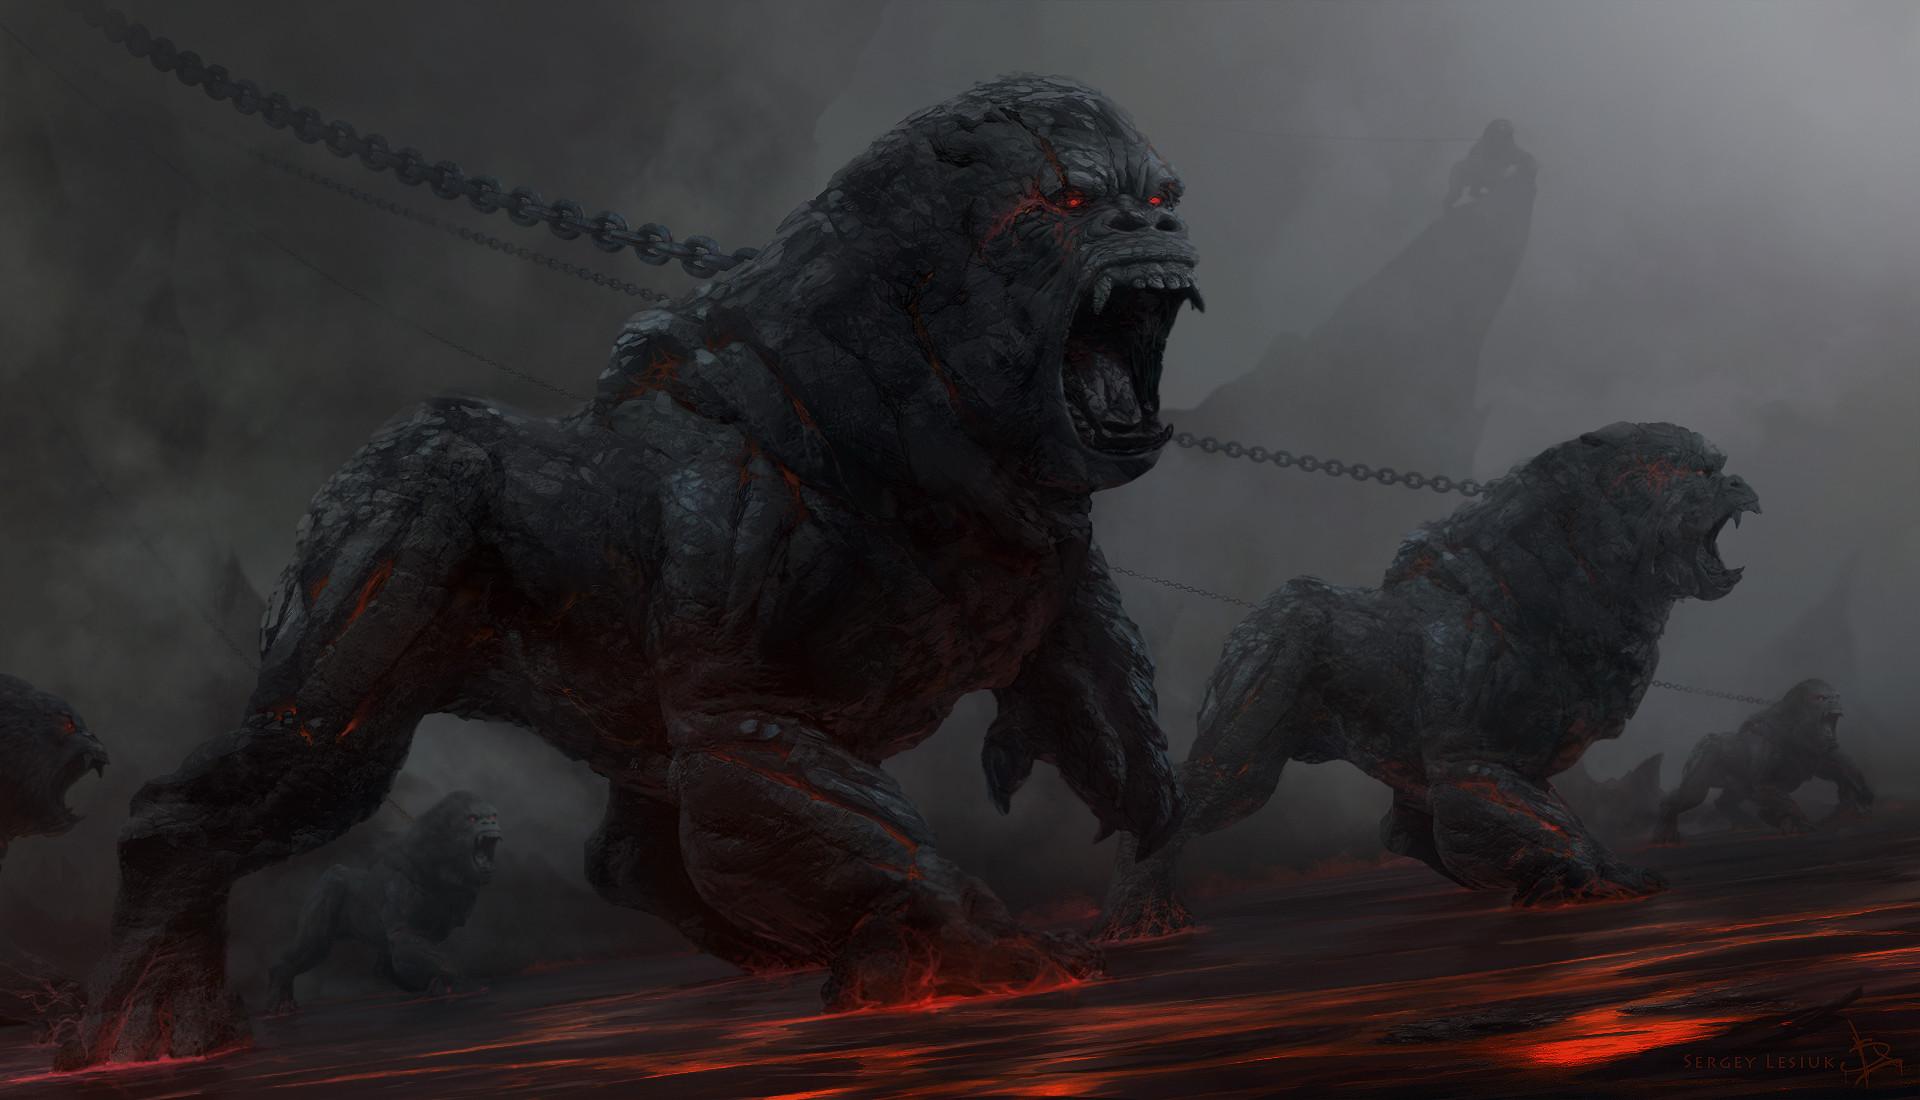 (Stone apes demons chained wallpaper fantasy high definition digital art  Hell demonic)